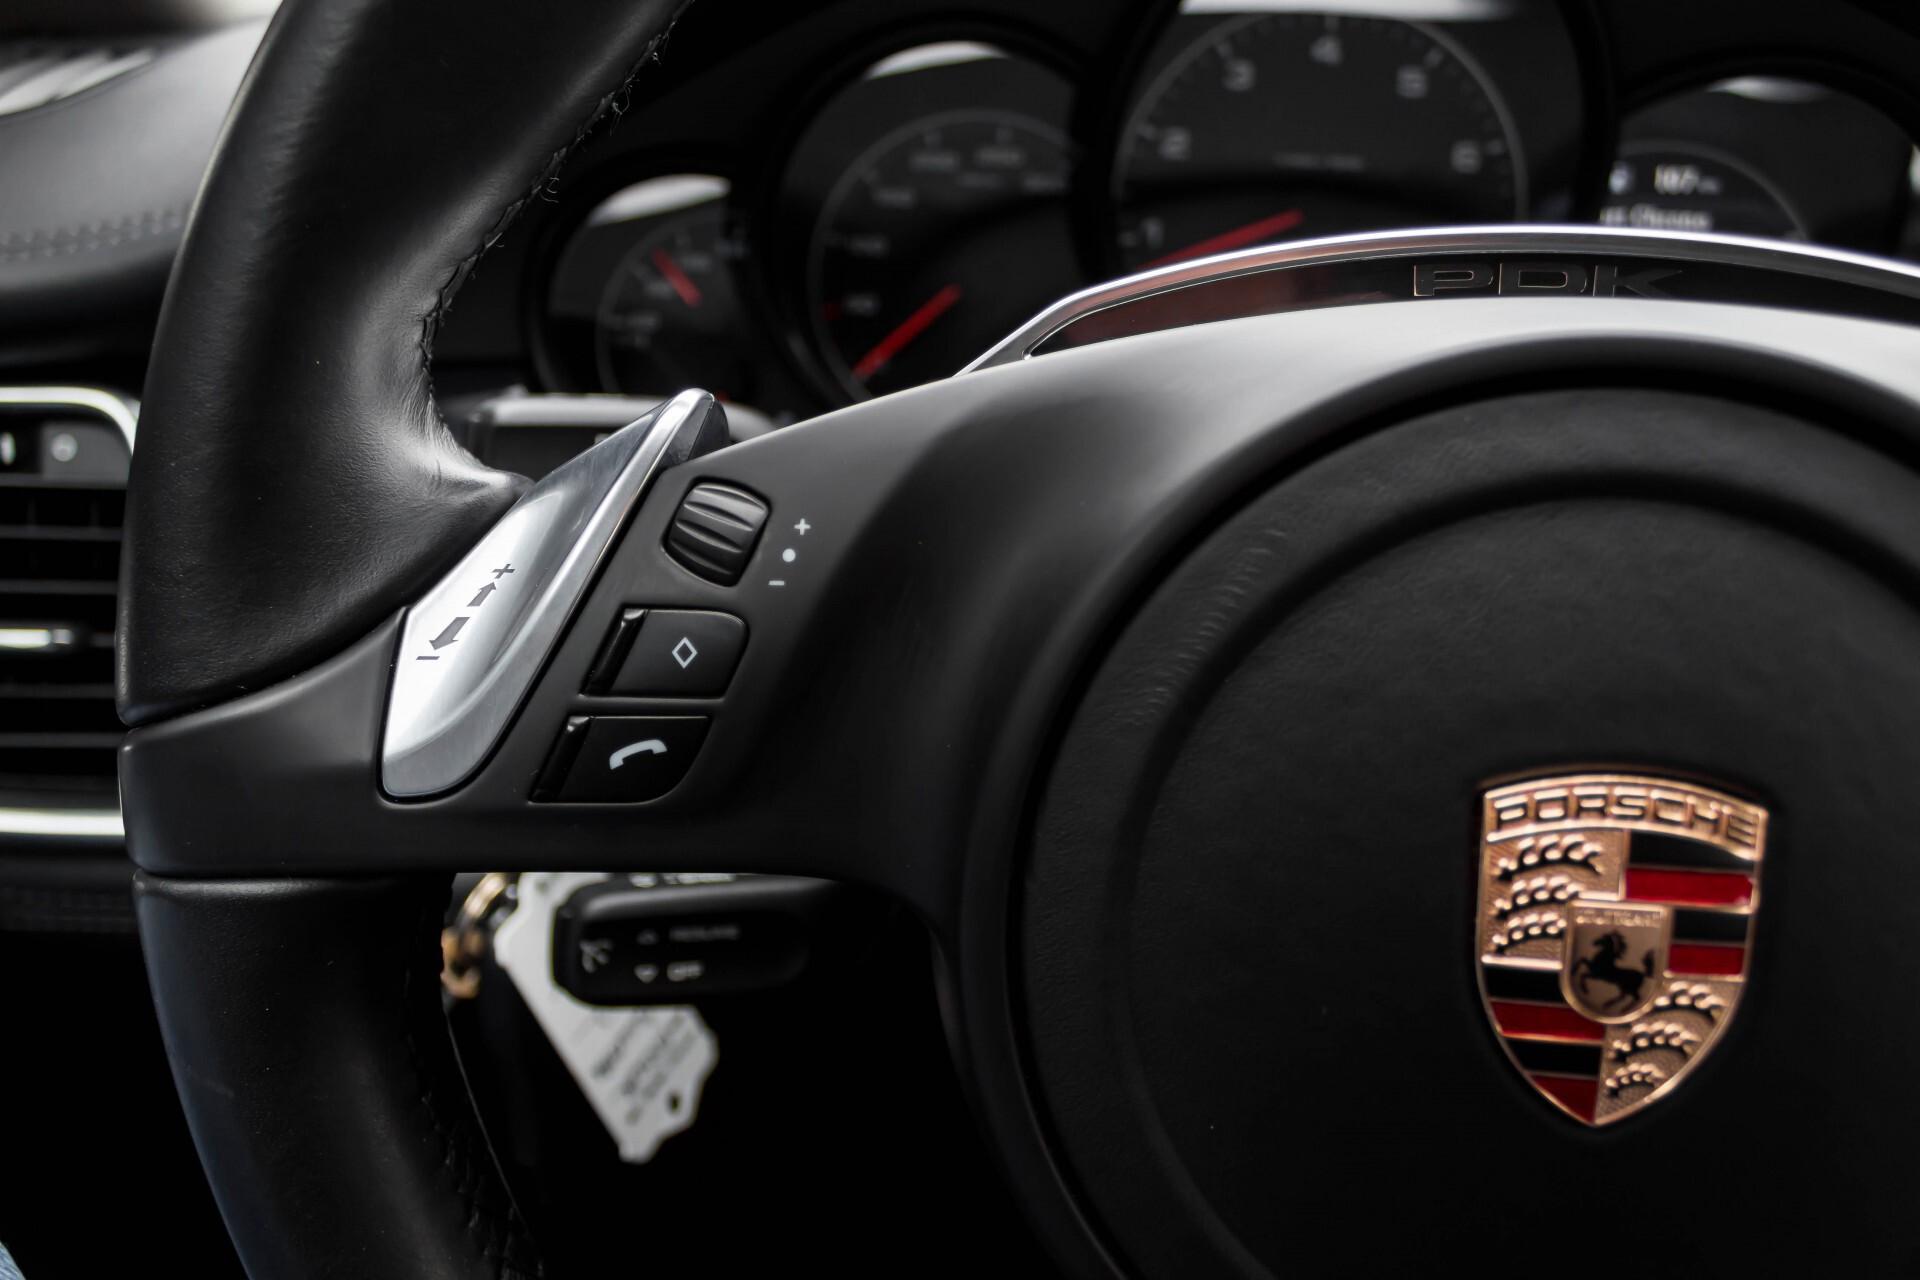 Porsche Panamera 3.6 4 Sportchrono/Luchtvering/Dak/Nappa/Aut7 Foto 11